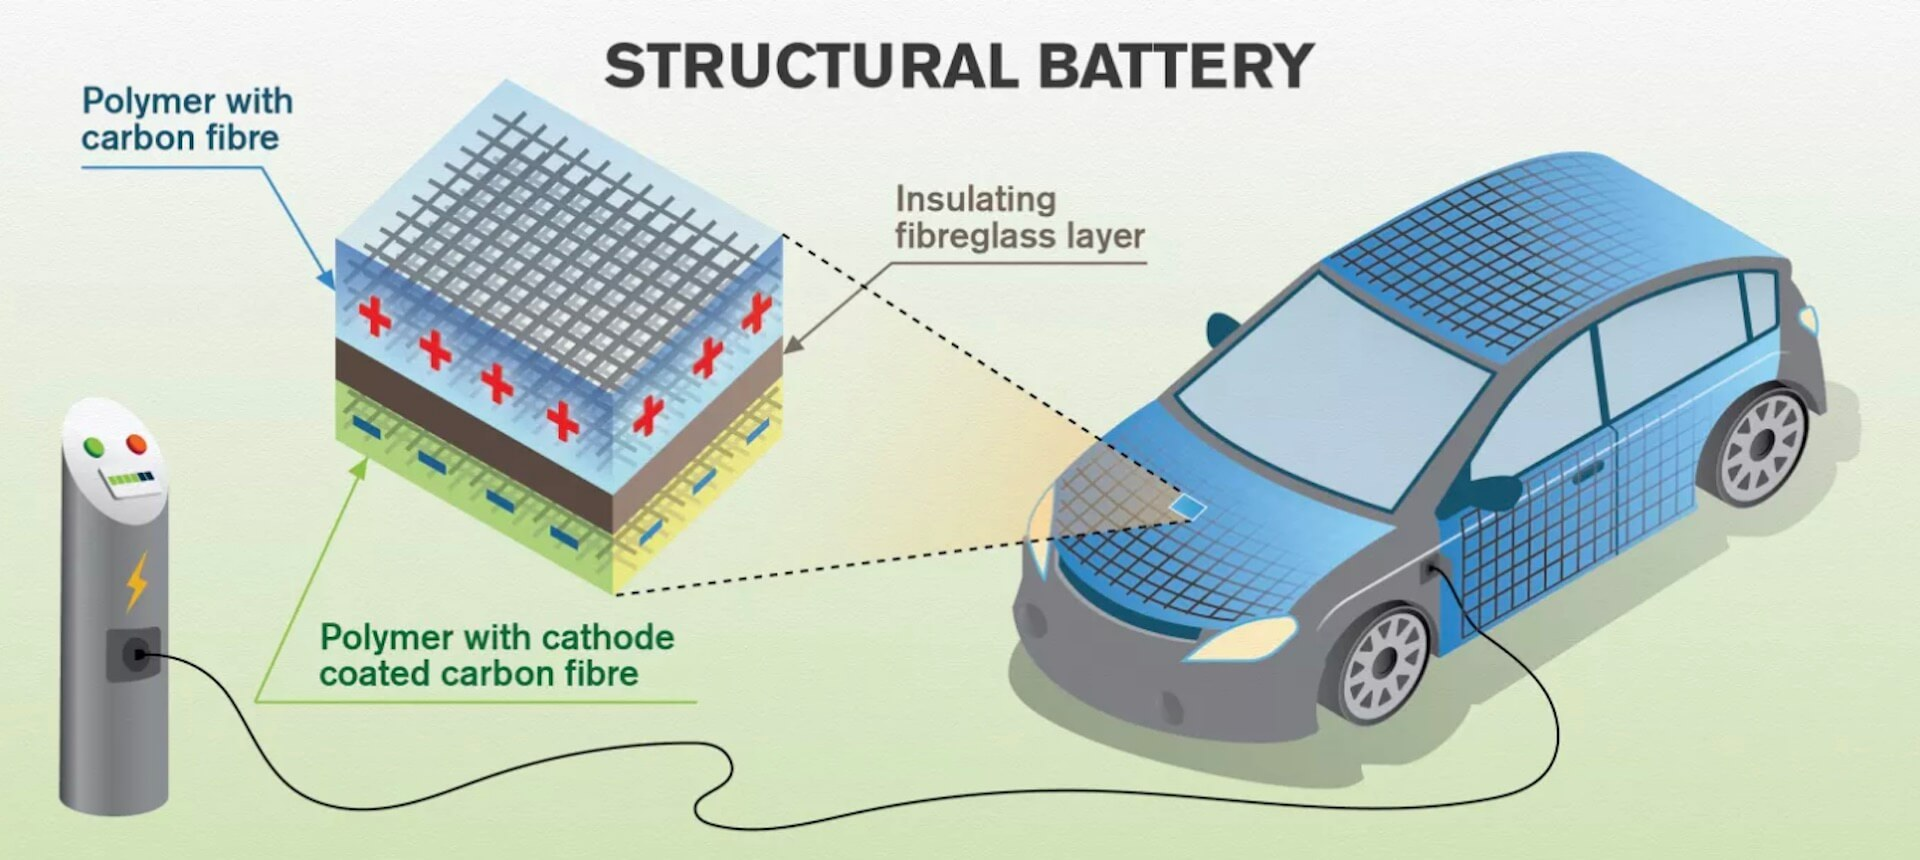 Структура кузова-батареи электромобиля из углеродного волокна